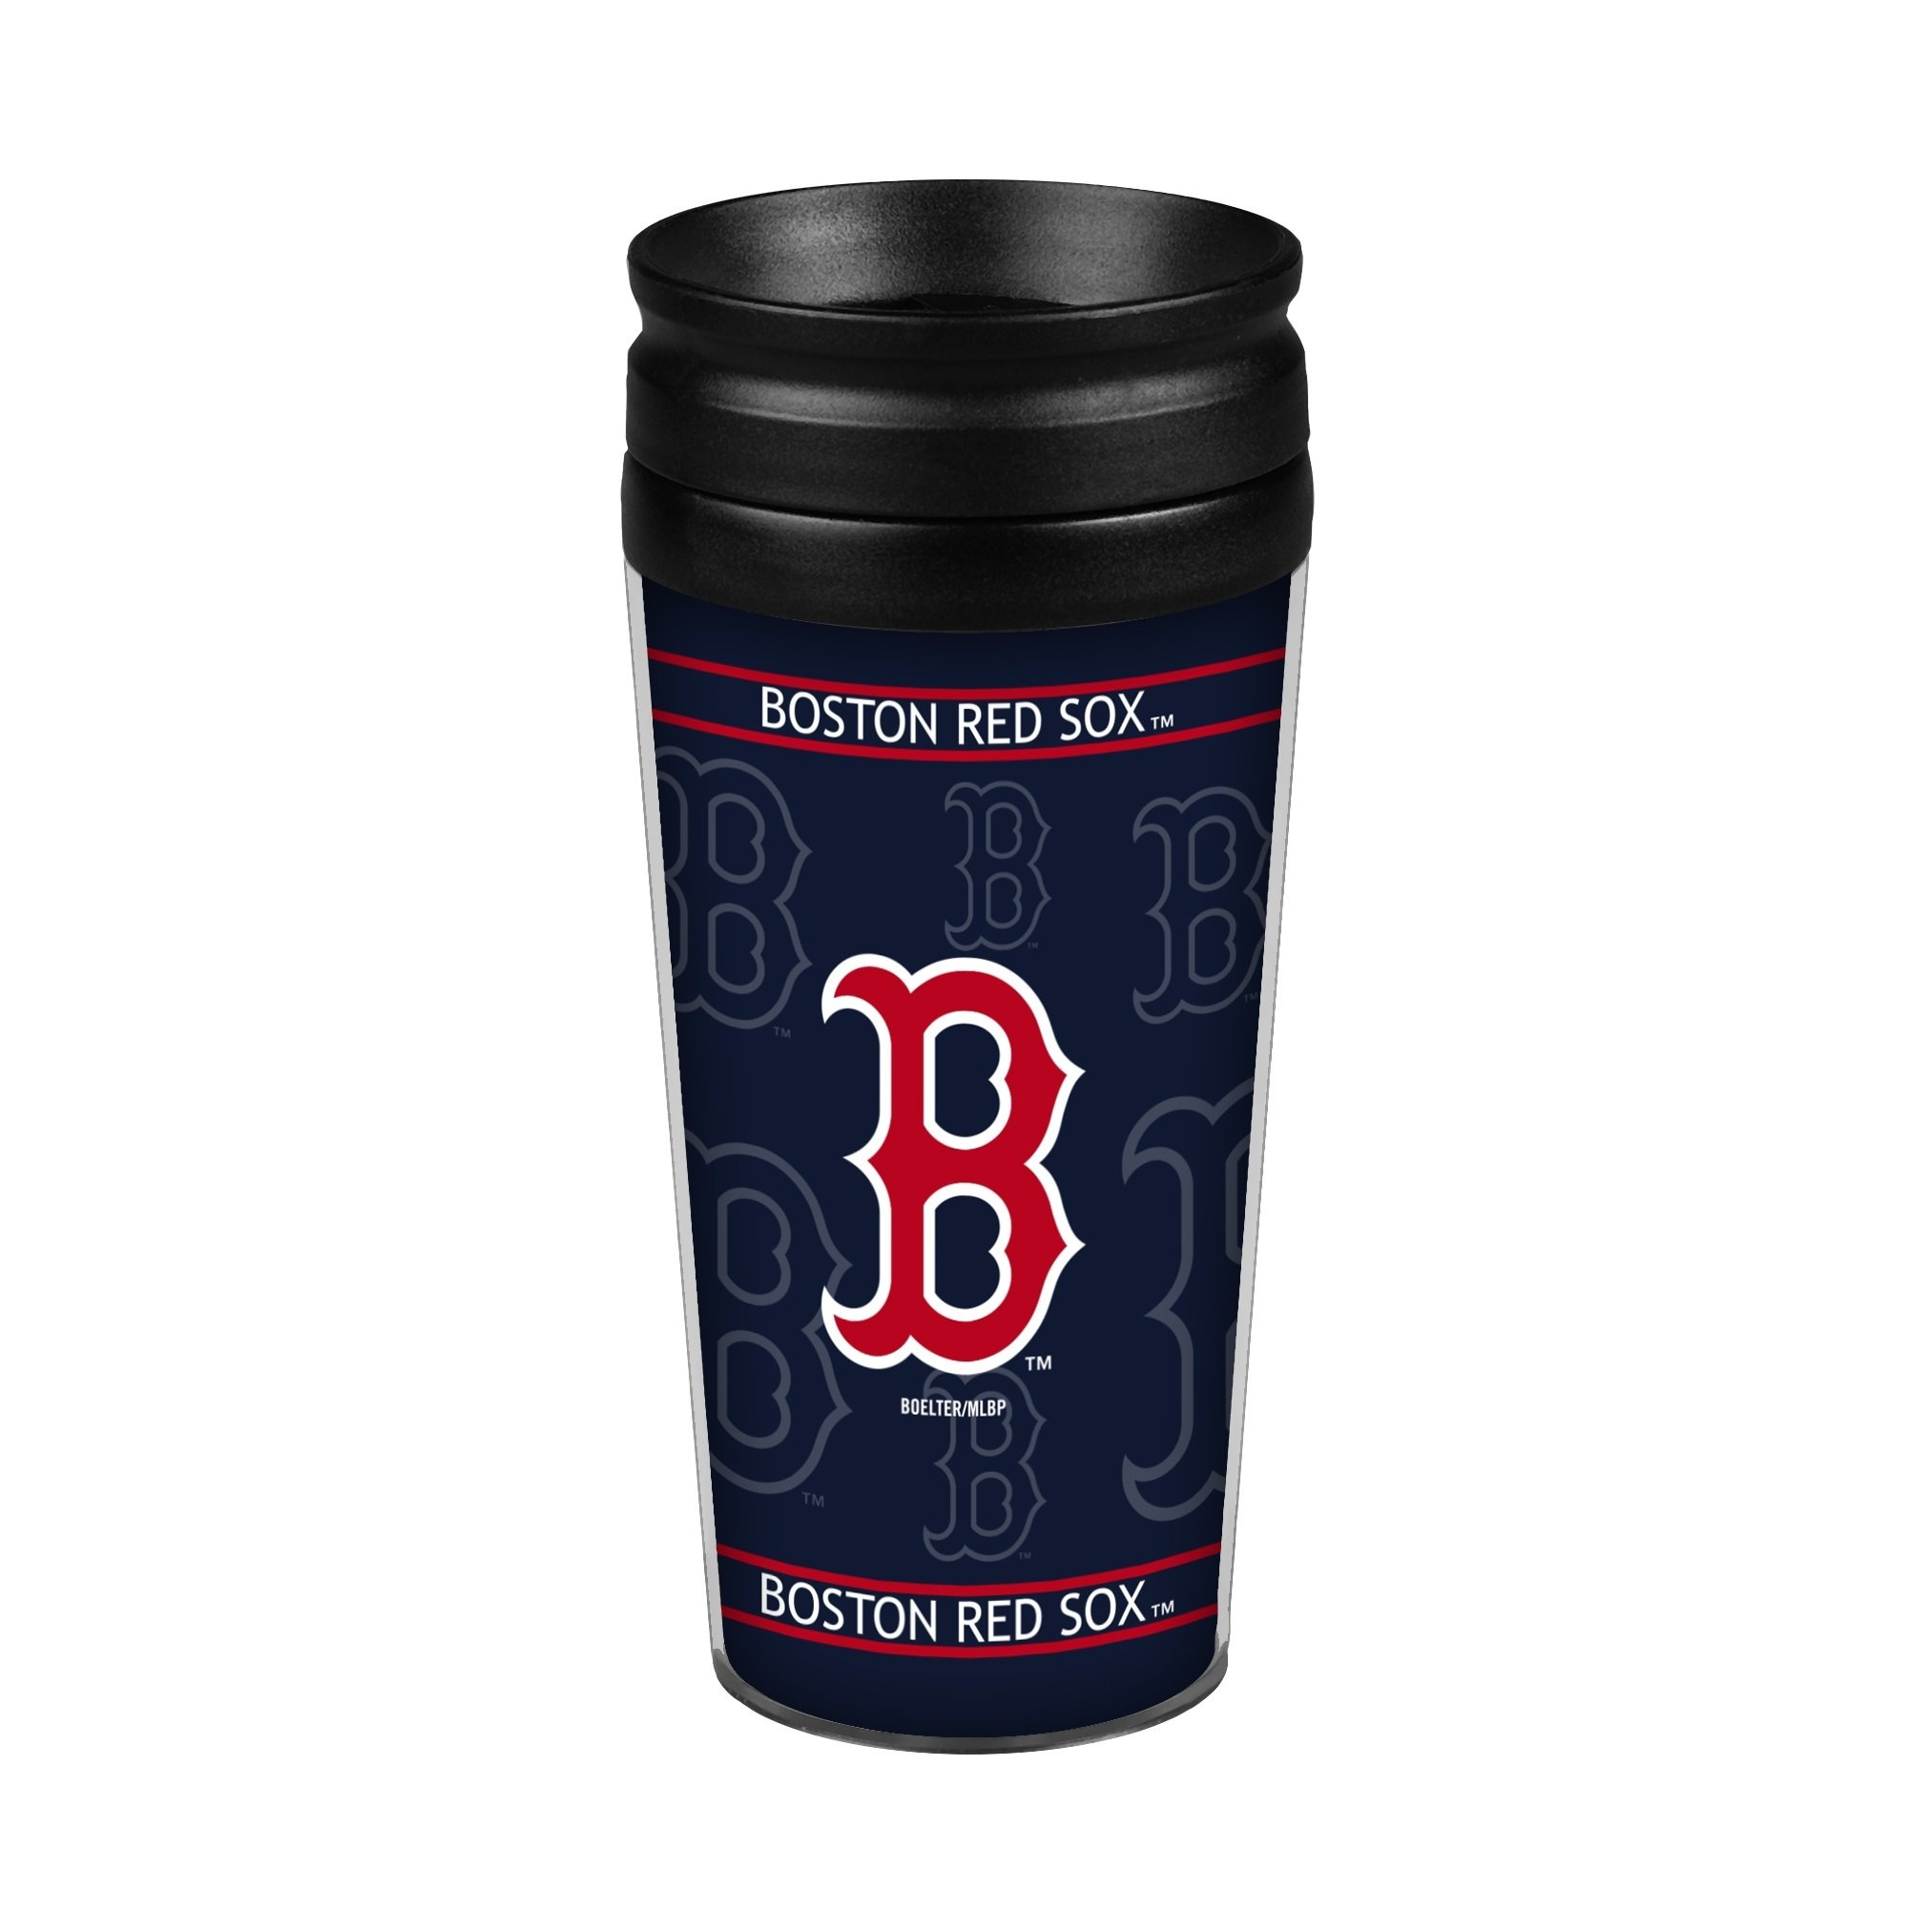 Boston Red Sox 14oz. Full Wrap Travel Mug by Boelter Brands